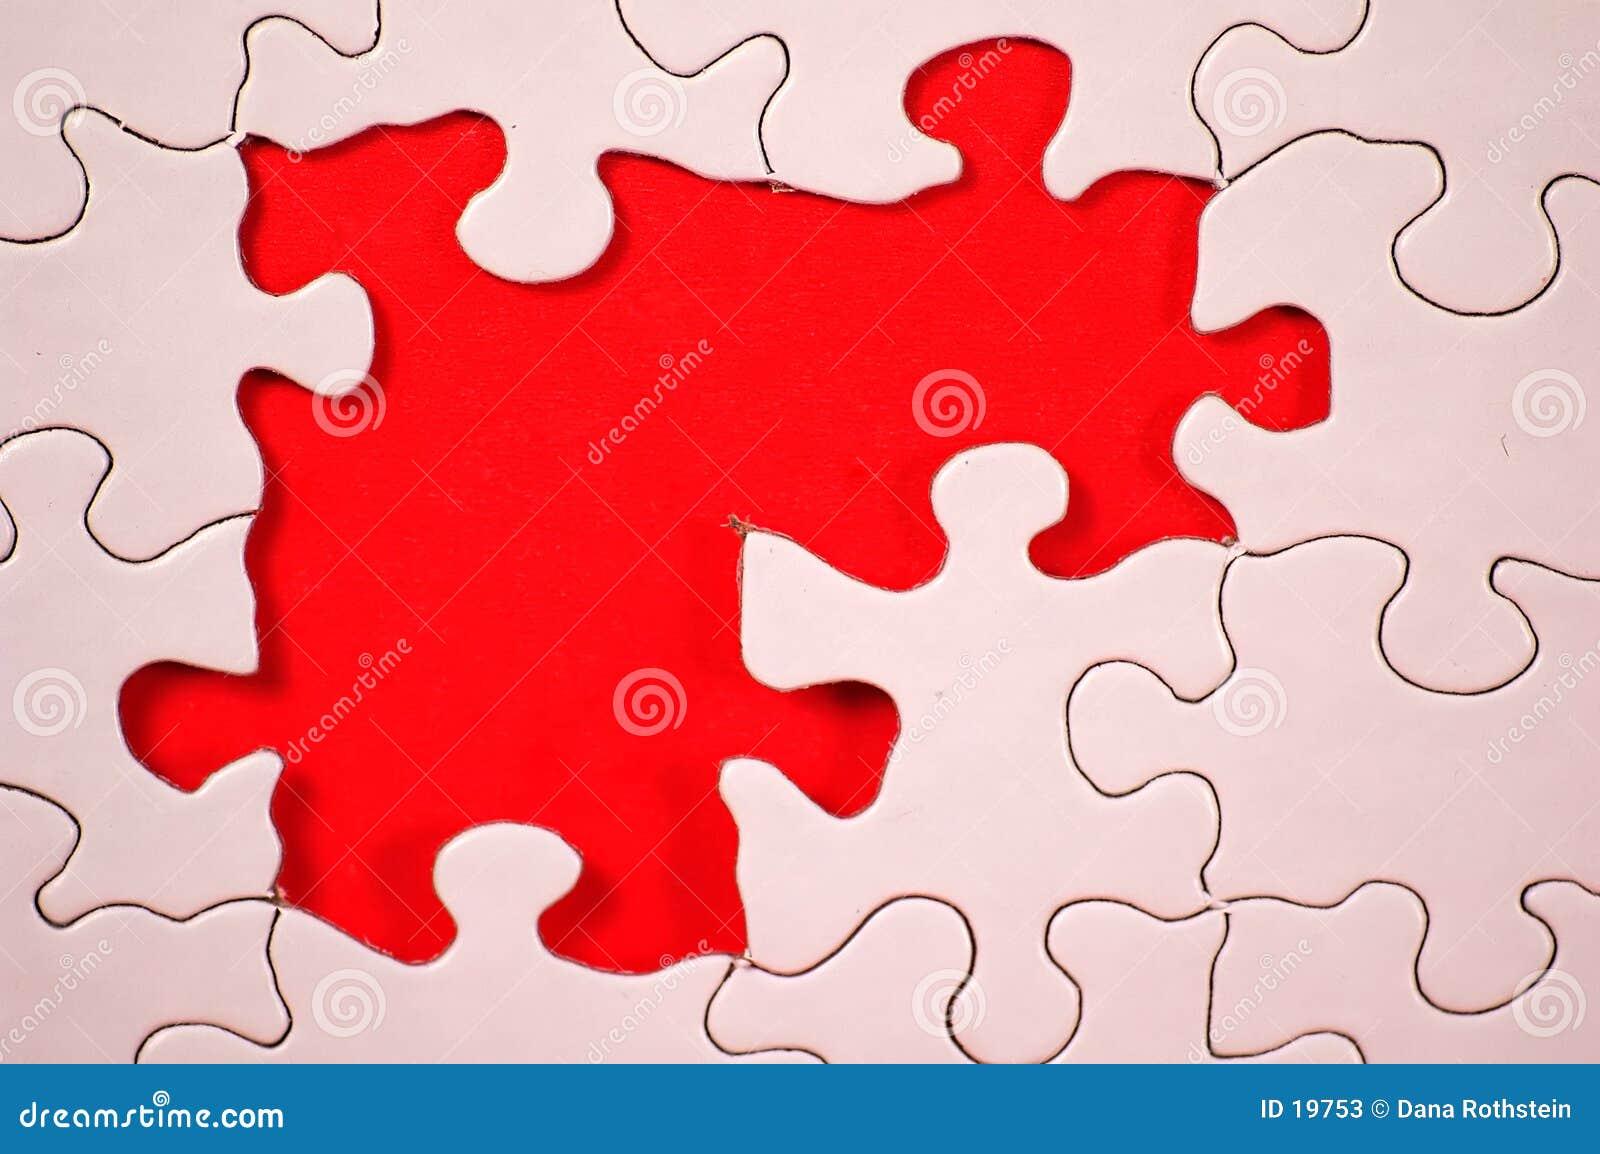 Puzzle With Orange Background